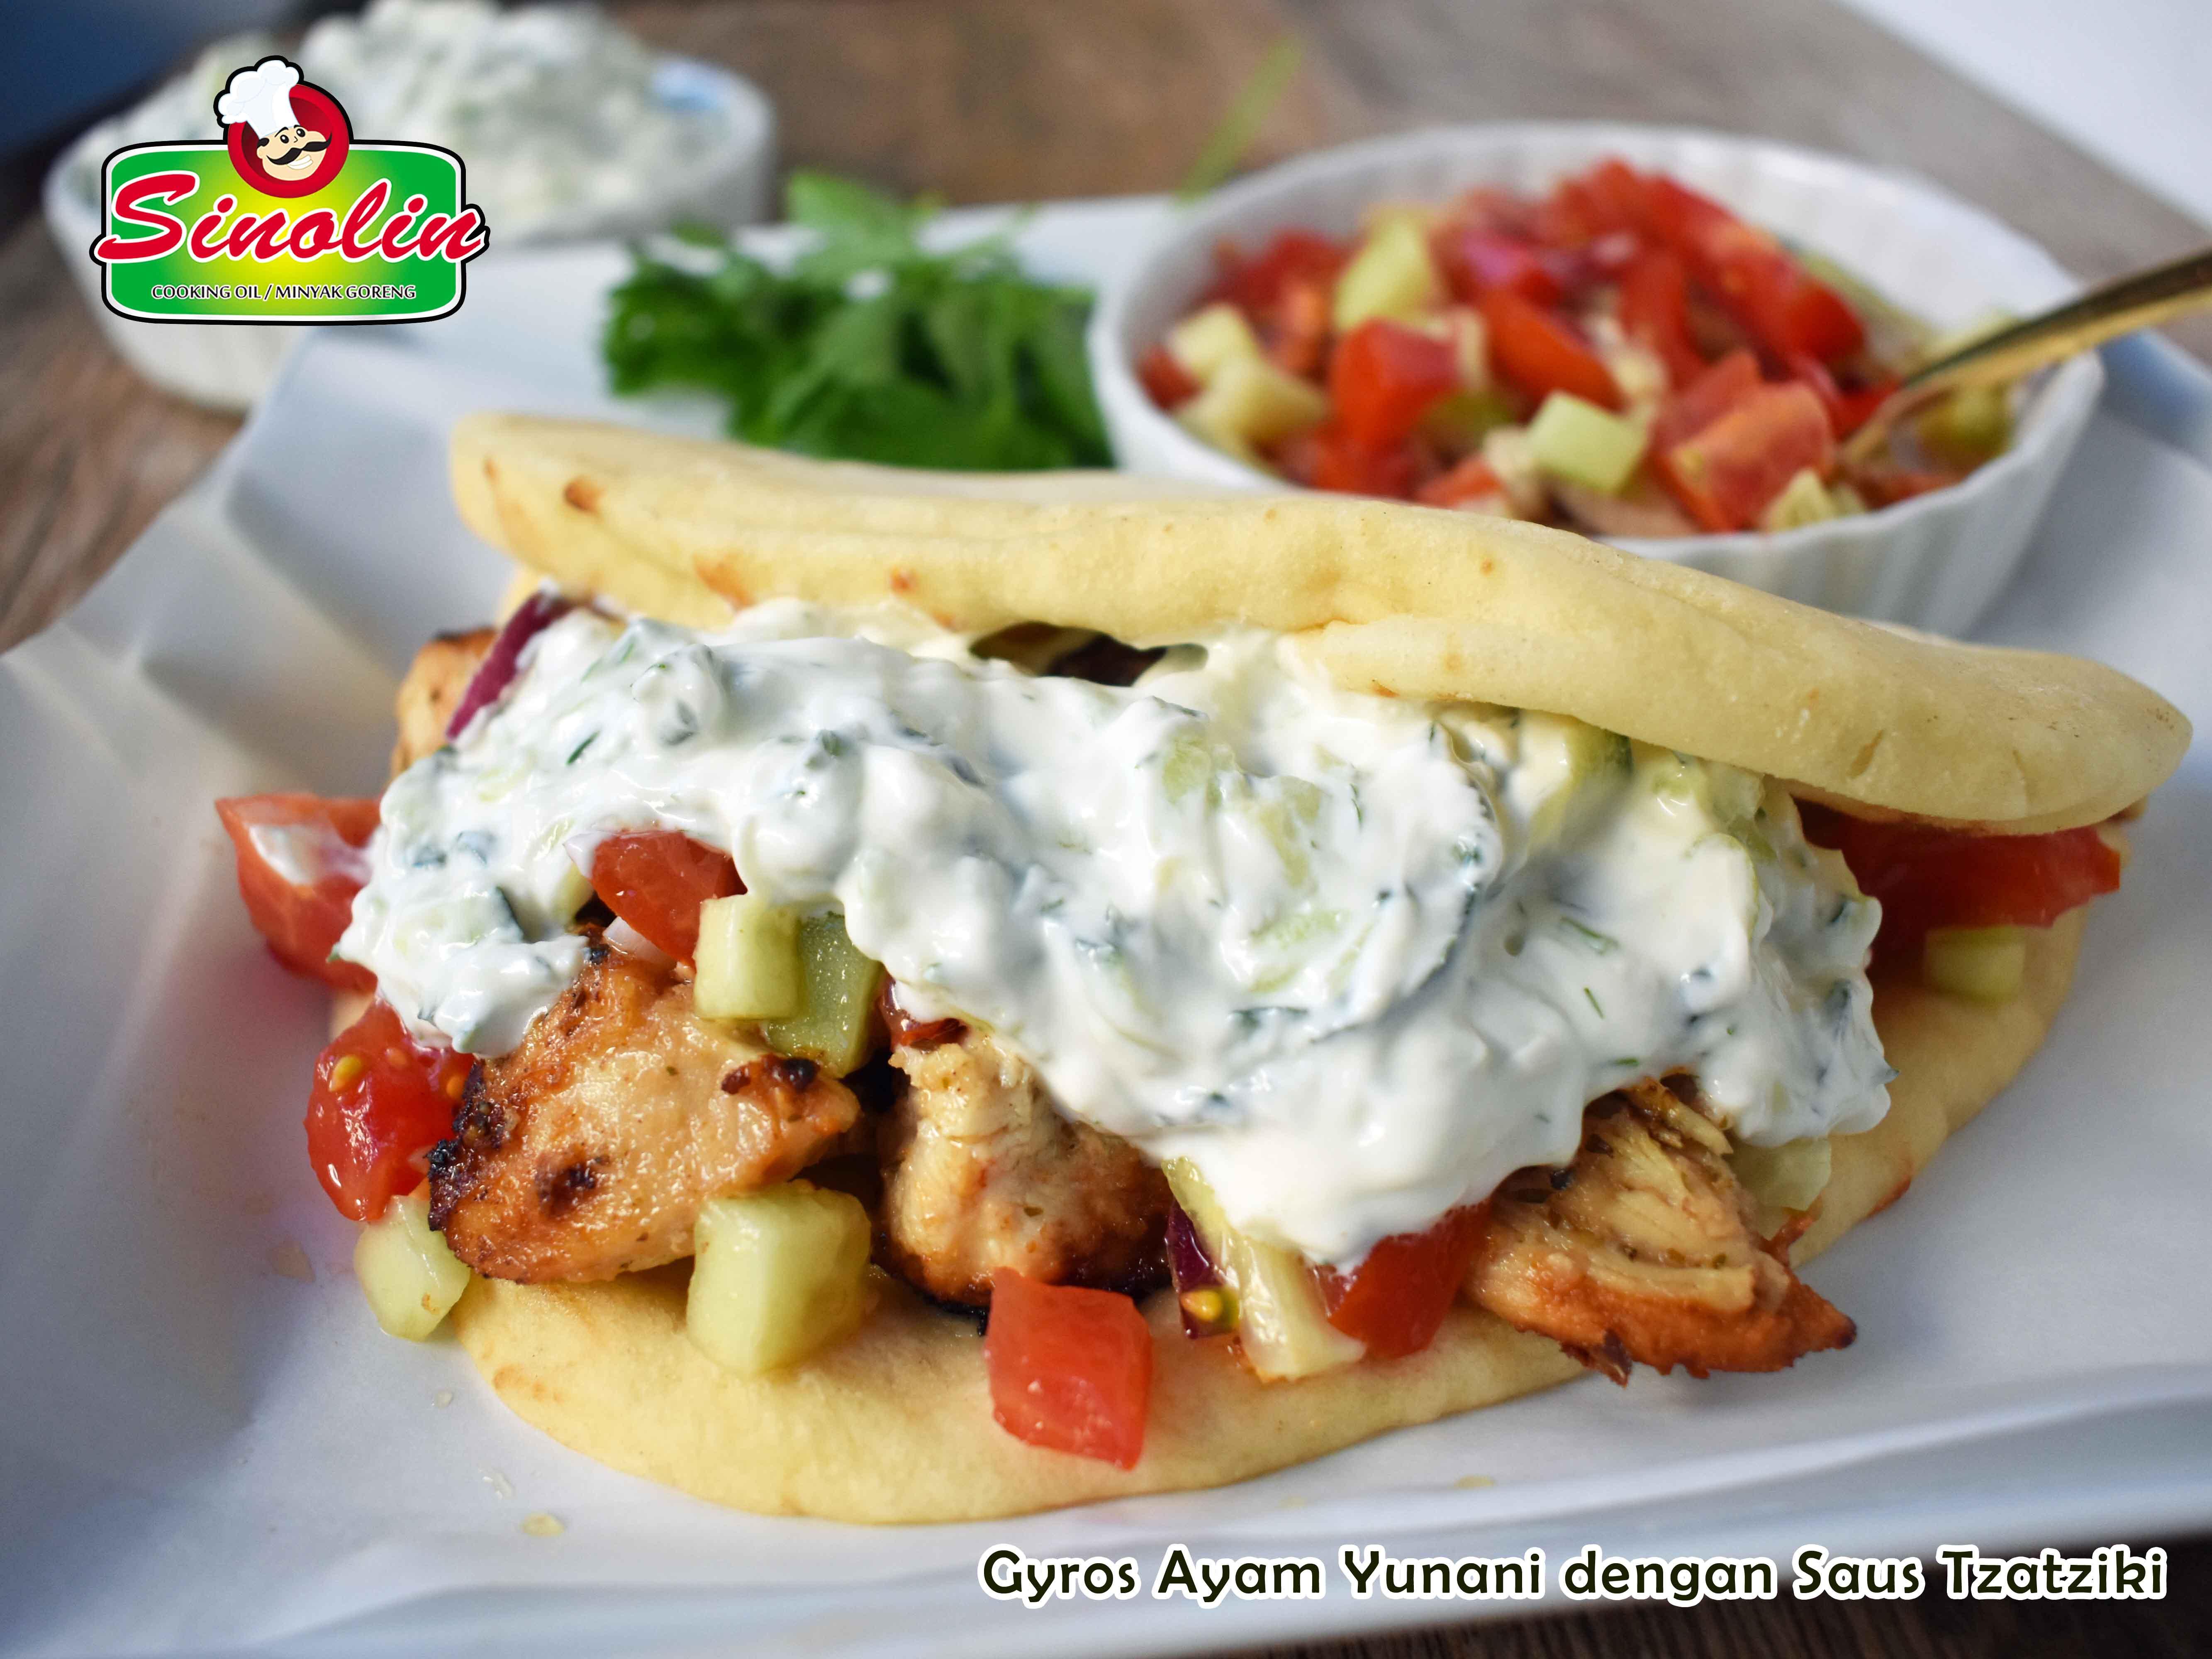 Gyros Ayam Yunani dengan Saus Tzatziki Oleh Dapur Sinolin